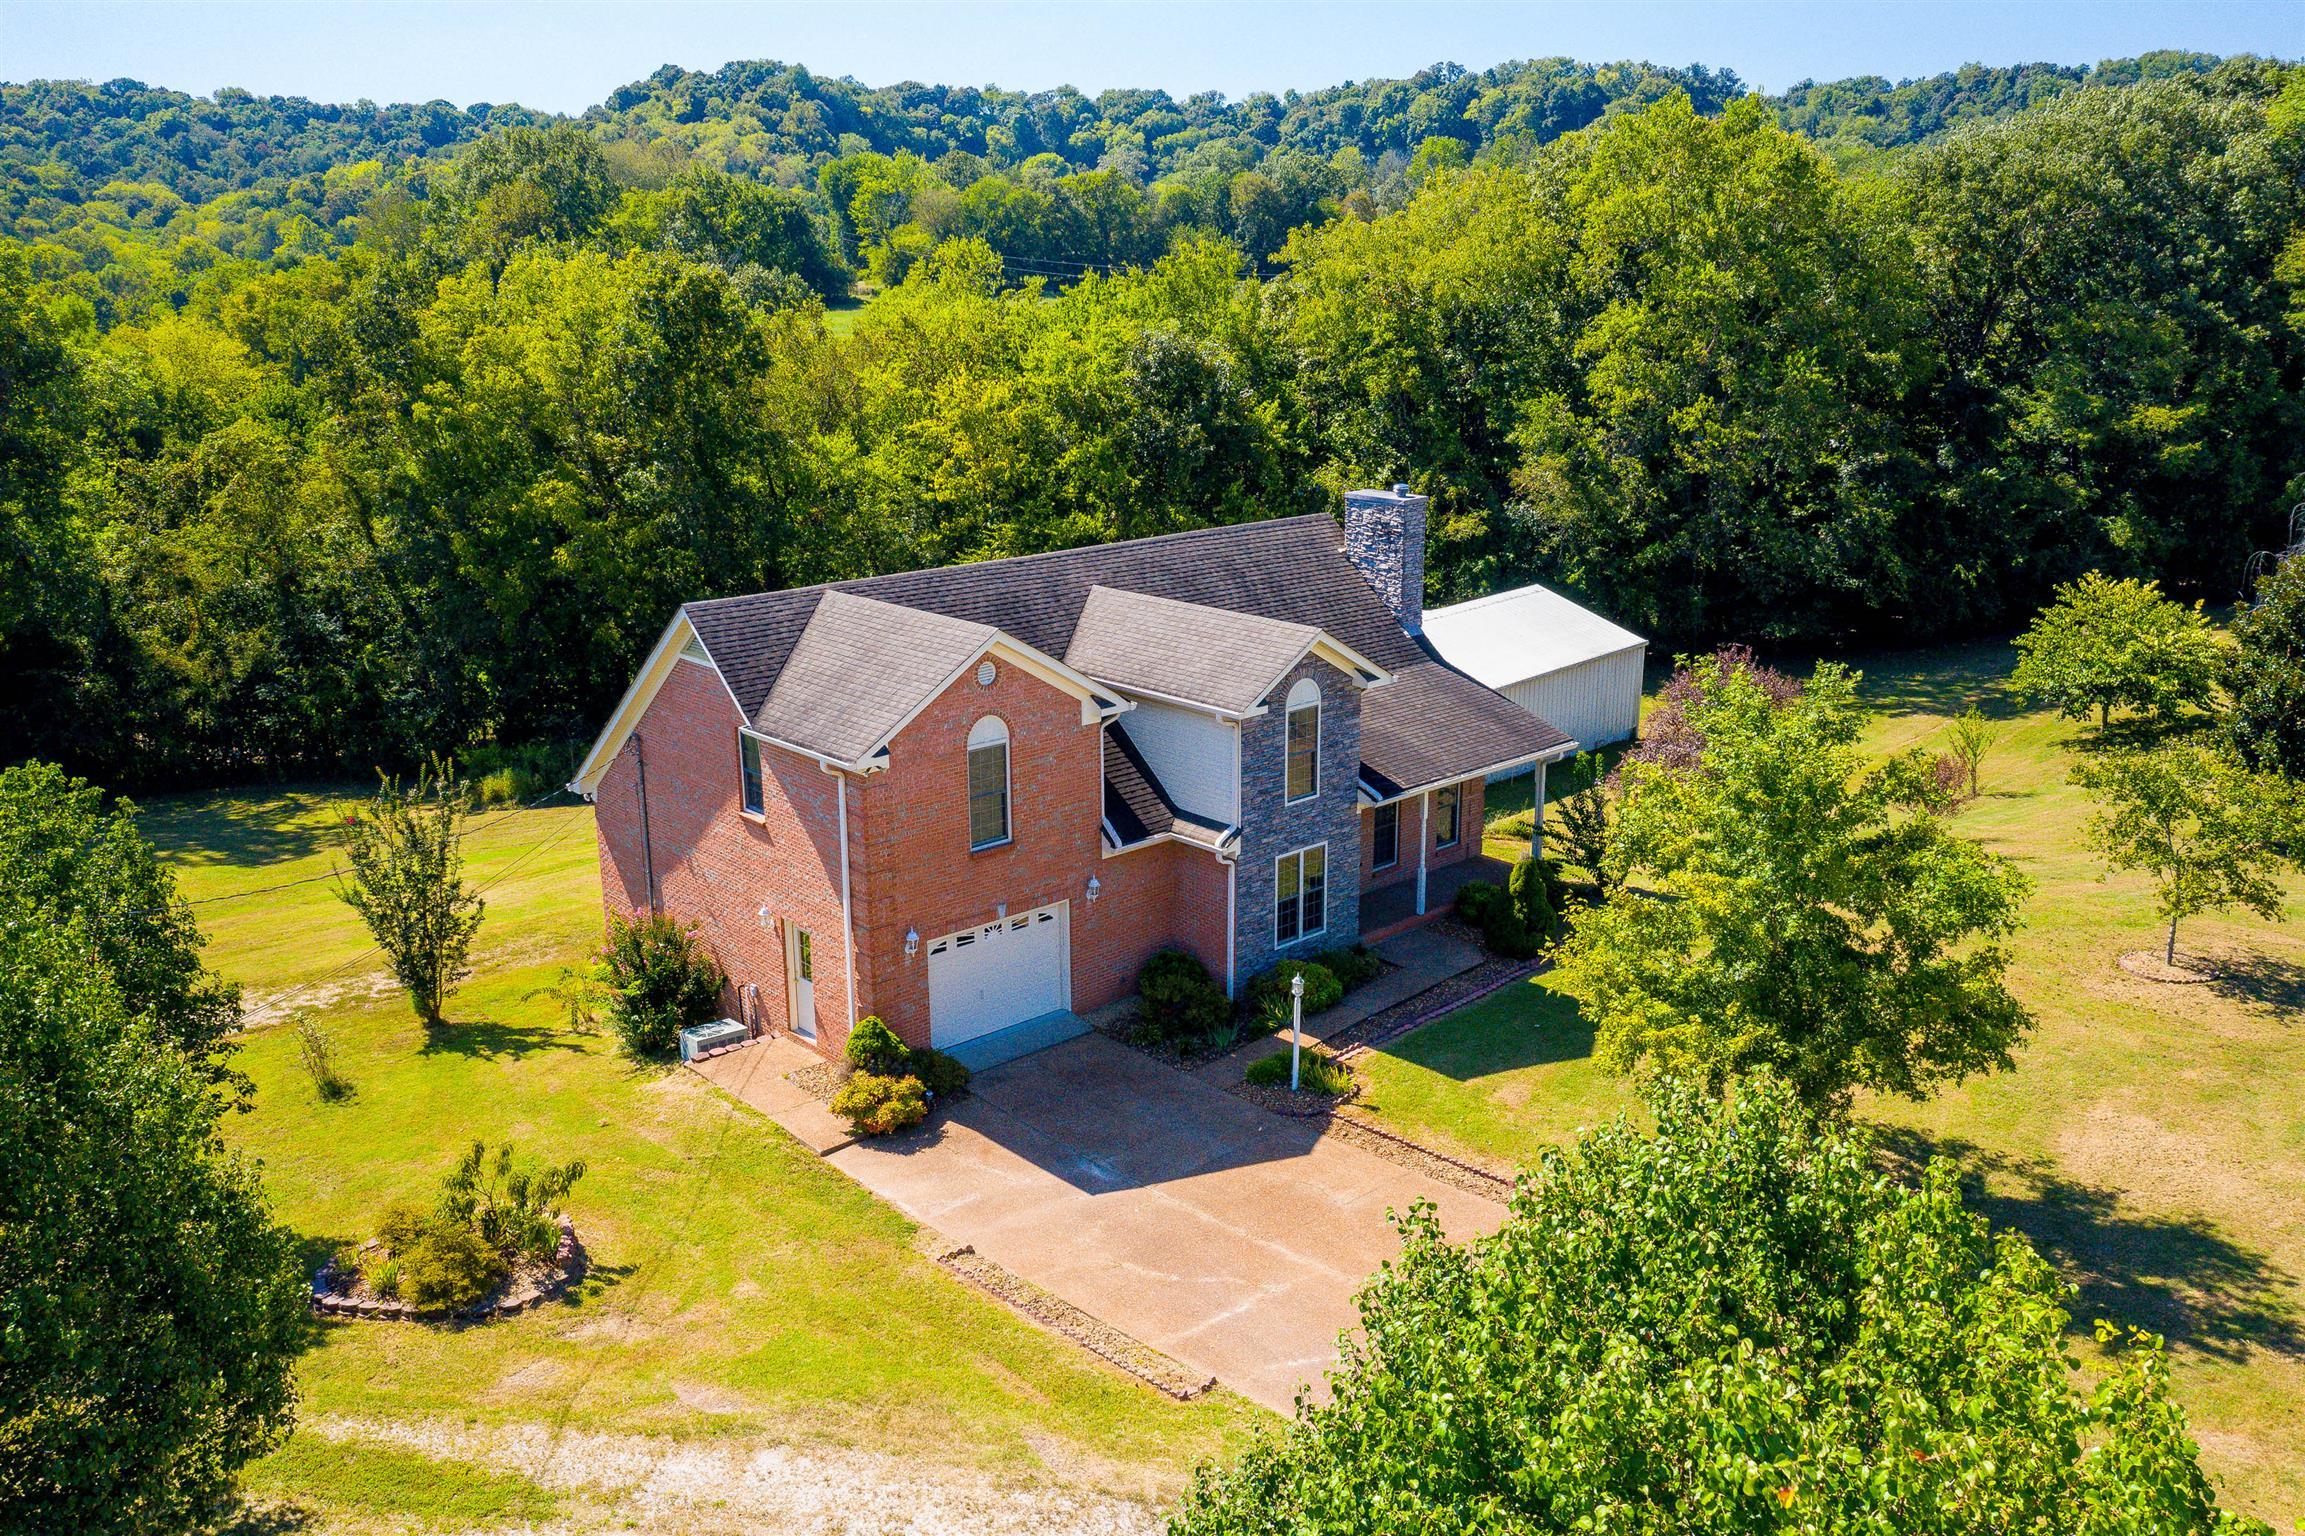 1793 New Highway 7, Columbia, TN 38401 - Columbia, TN real estate listing